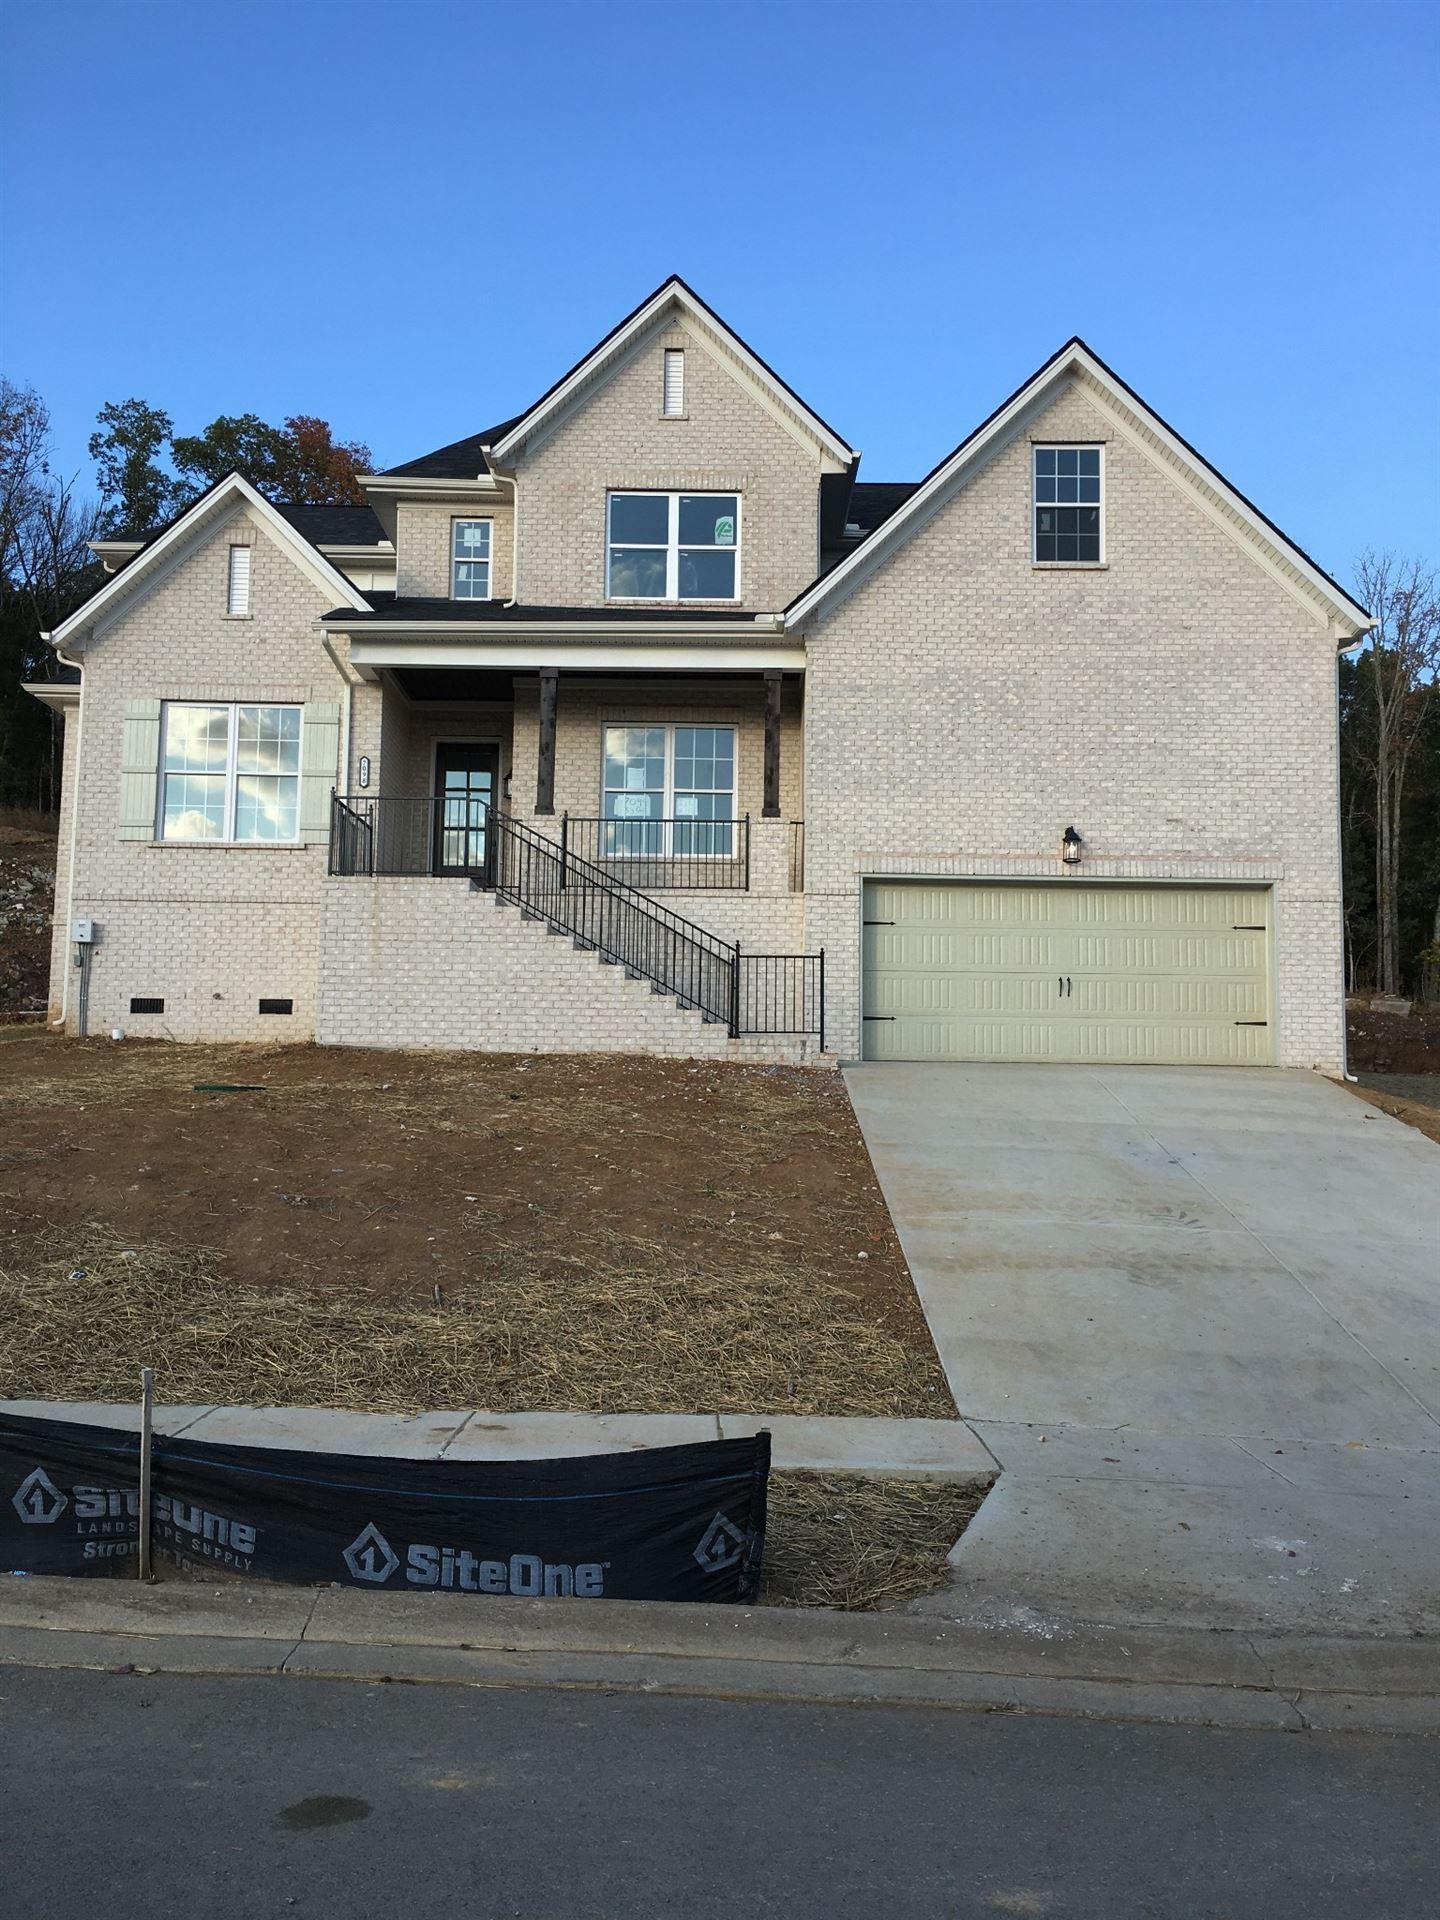 7098 Big Oak Lane - Lot 119, Nolensville, TN 37135 - MLS#: 2209465